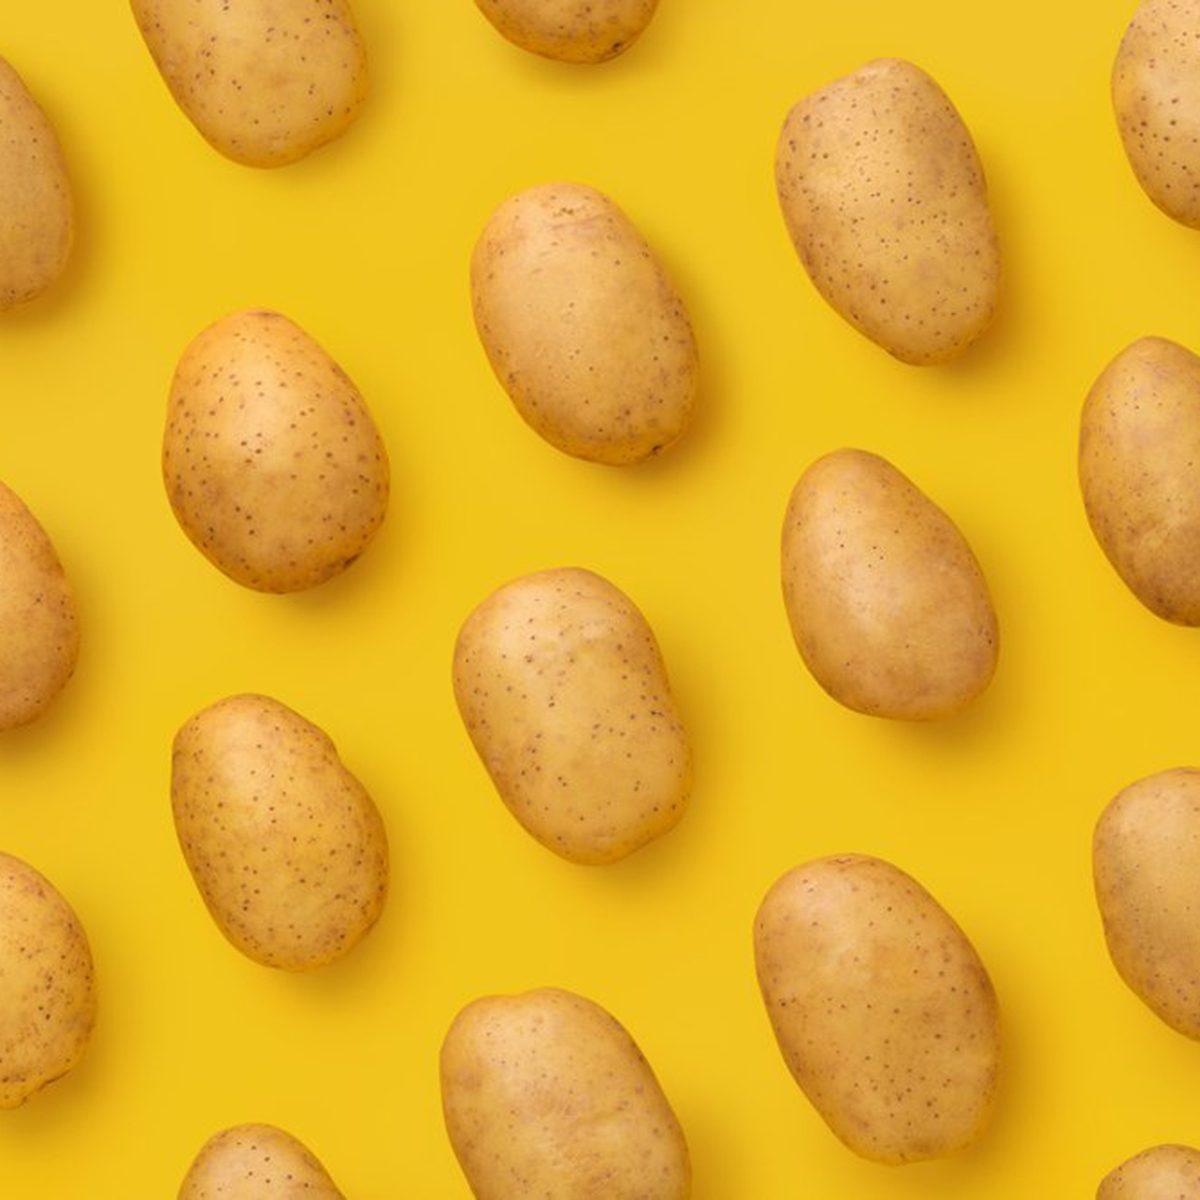 Potatoes pattern